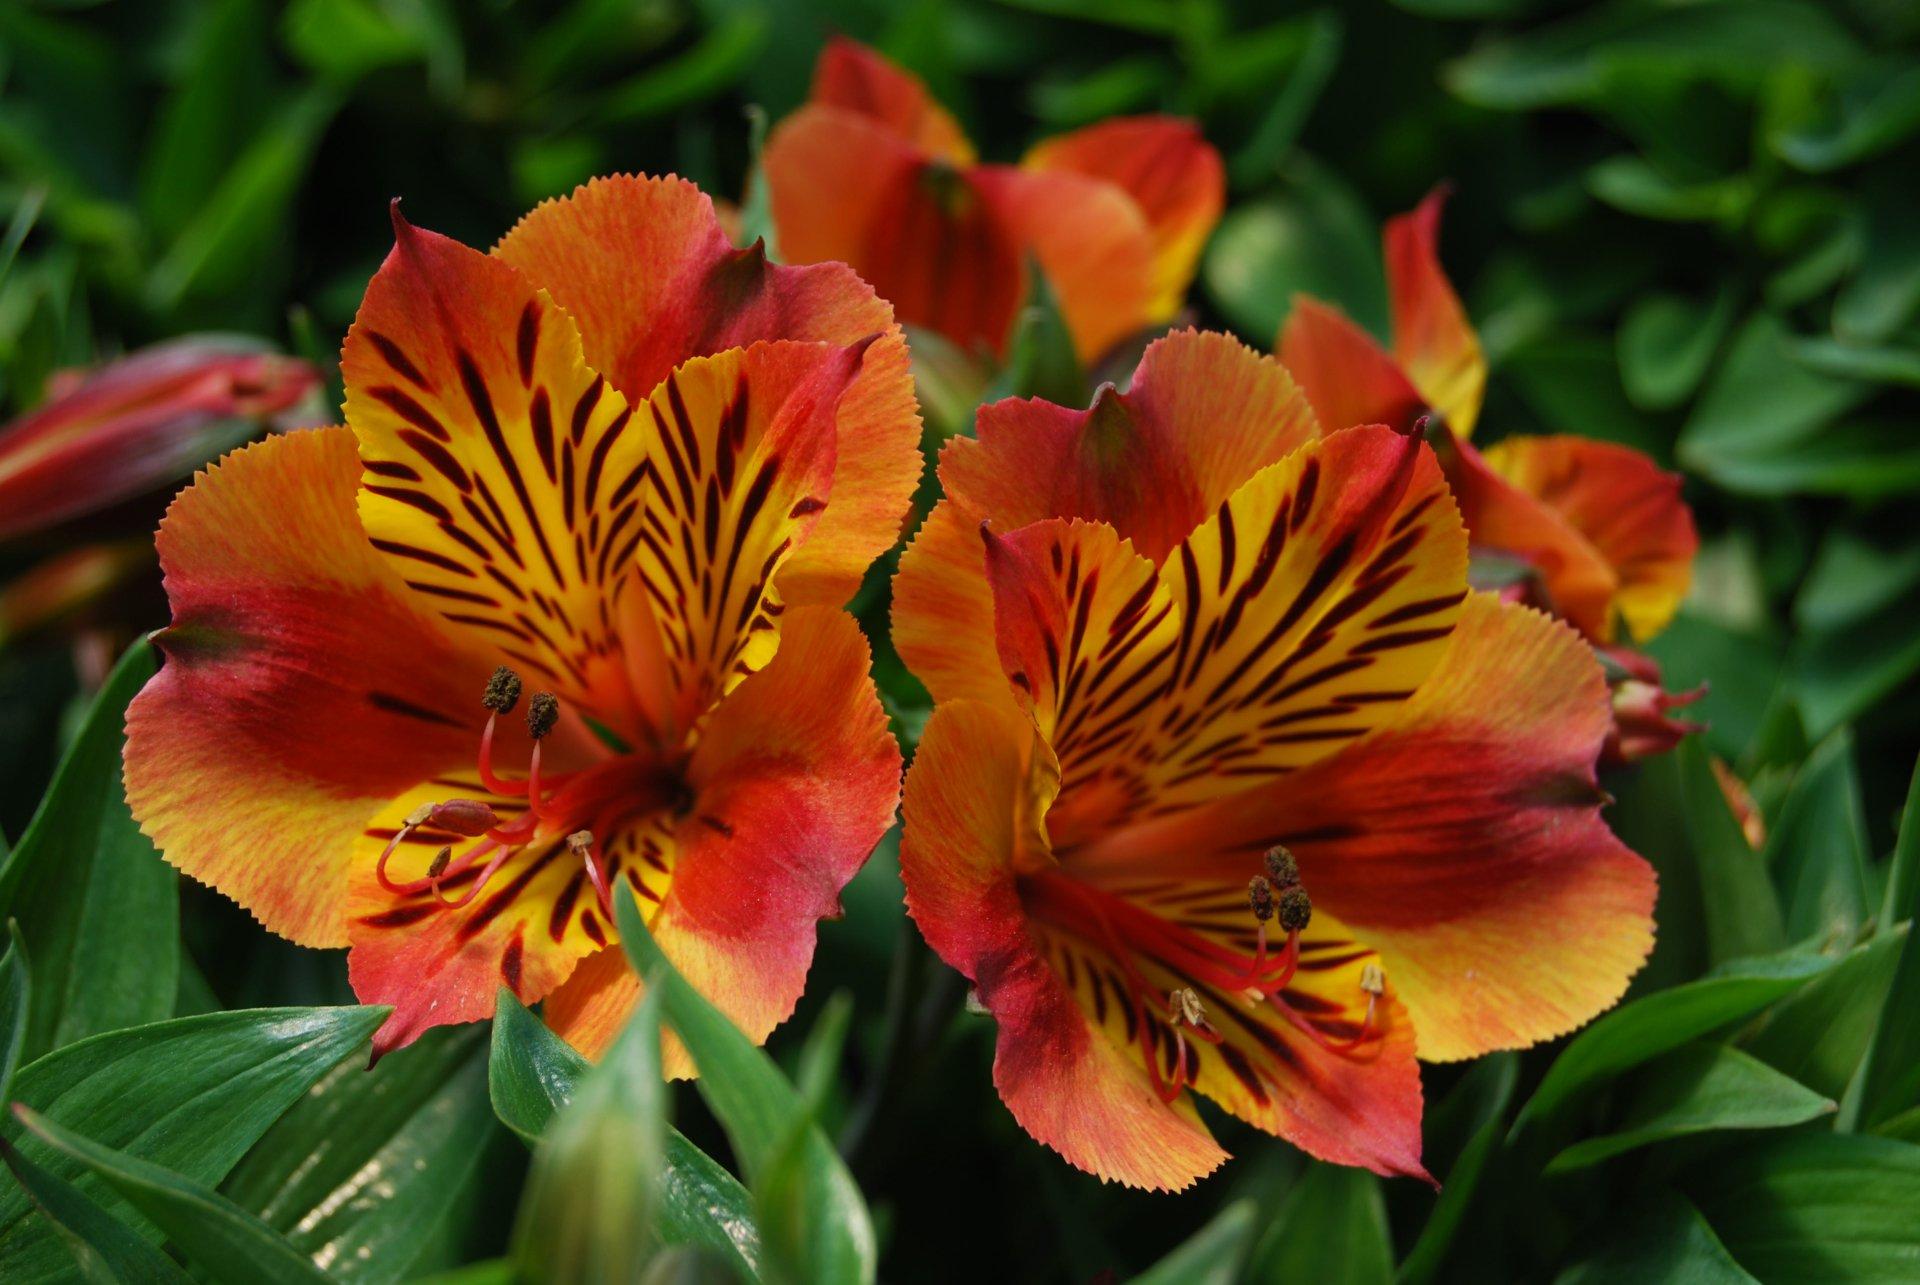 Iphone 6 Orange Flower Wallpaper Fiori 4k Ultra Hd Sfondo And Sfondi 3872x2592 Id 347111